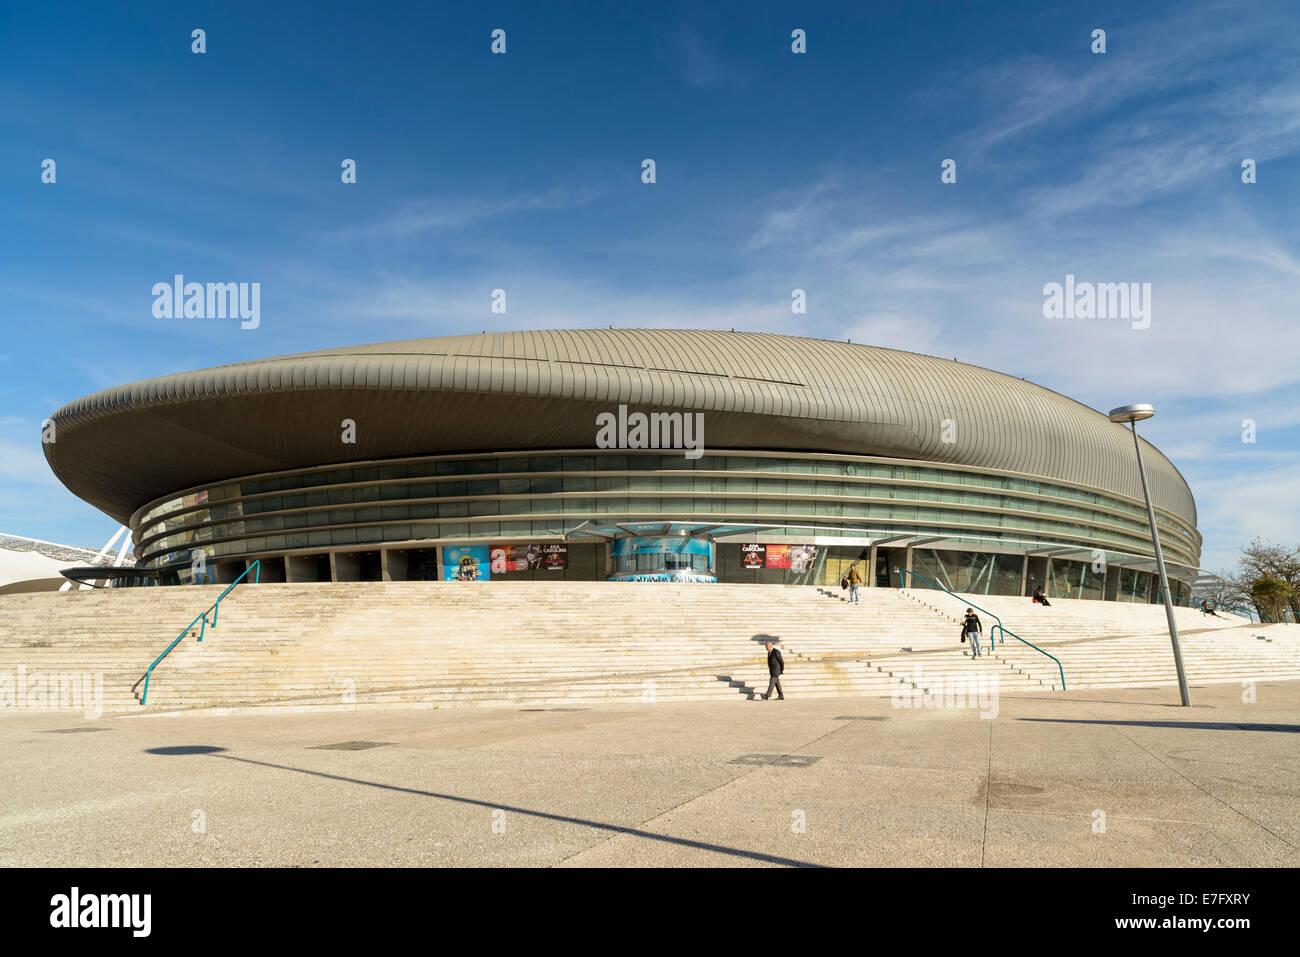 Atlantic Pavilion, Parque das Nacoes, Lisbon, Portugal, Europe - Stock Image